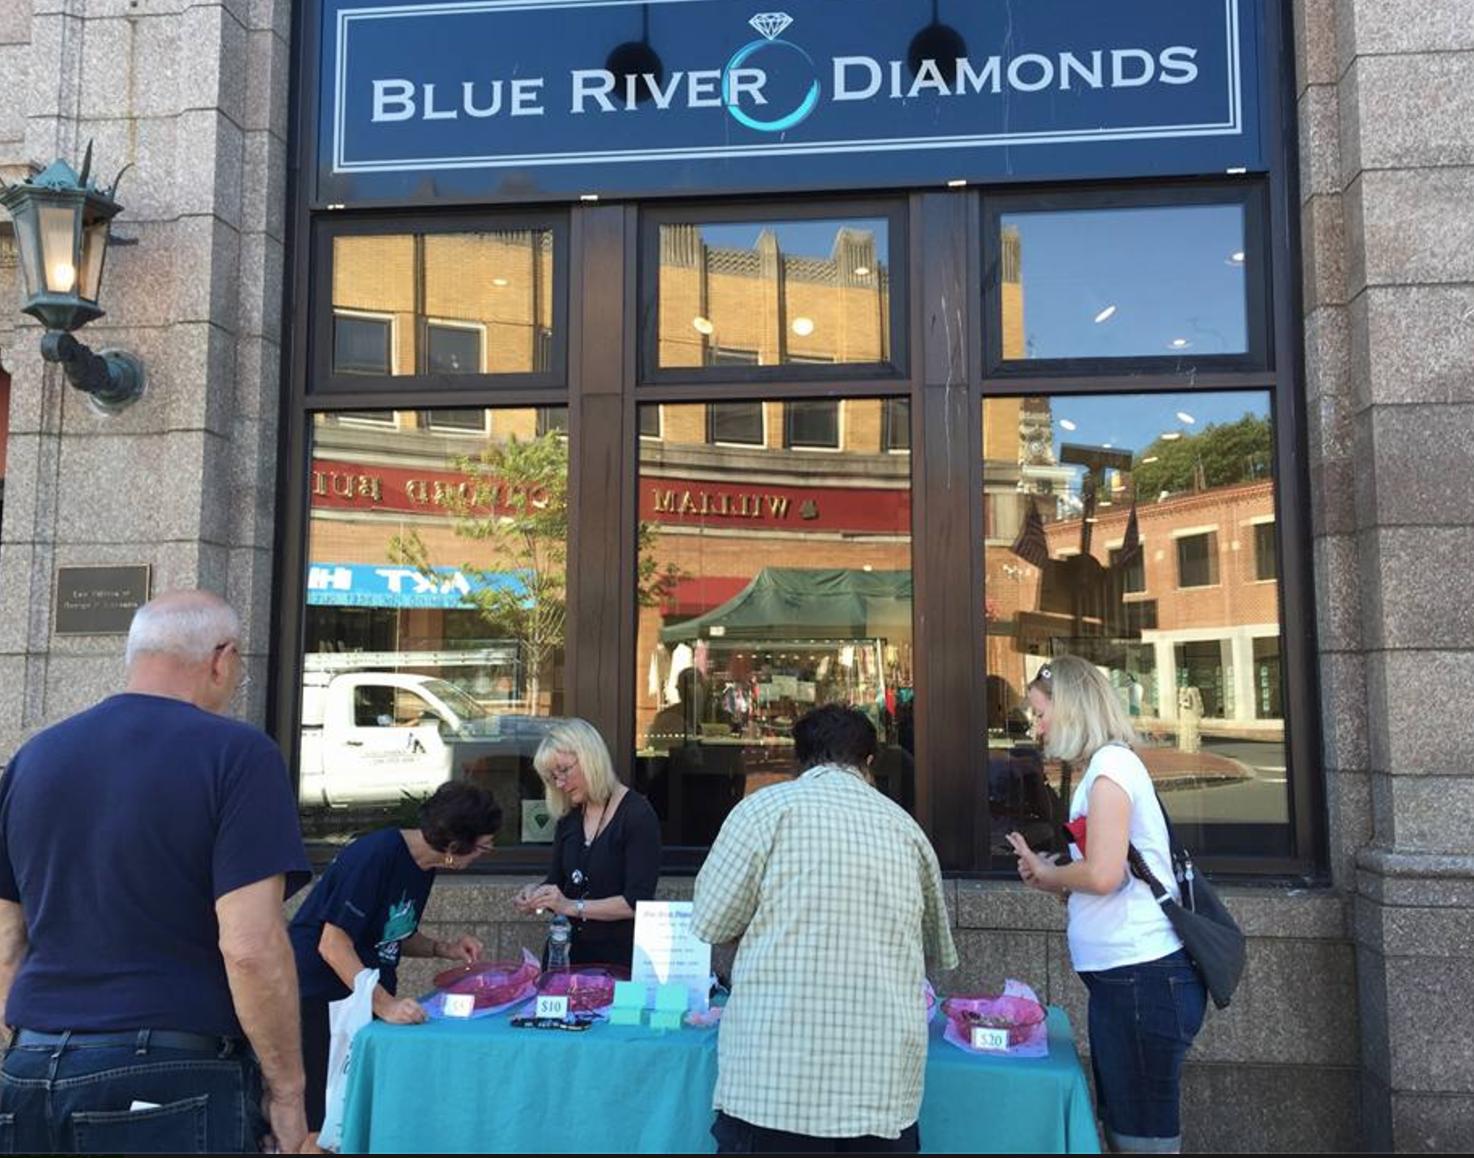 Blue River Diamonds